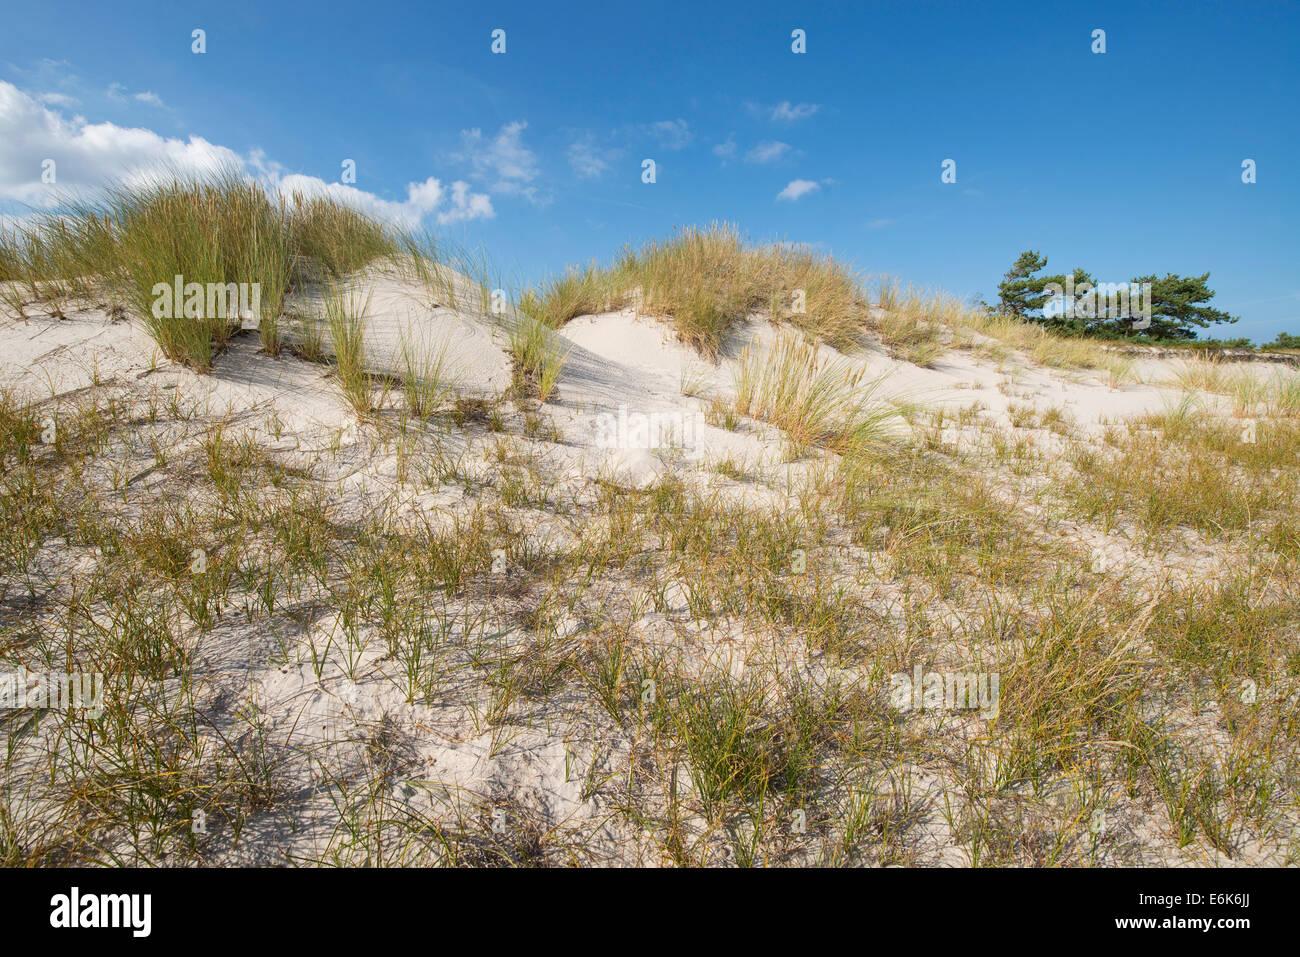 Dunes, Darßer Ort, Darß, Western Pomerania Lagoon Area National Park, Mecklenburg-Western Pomerania, Germany - Stock Image